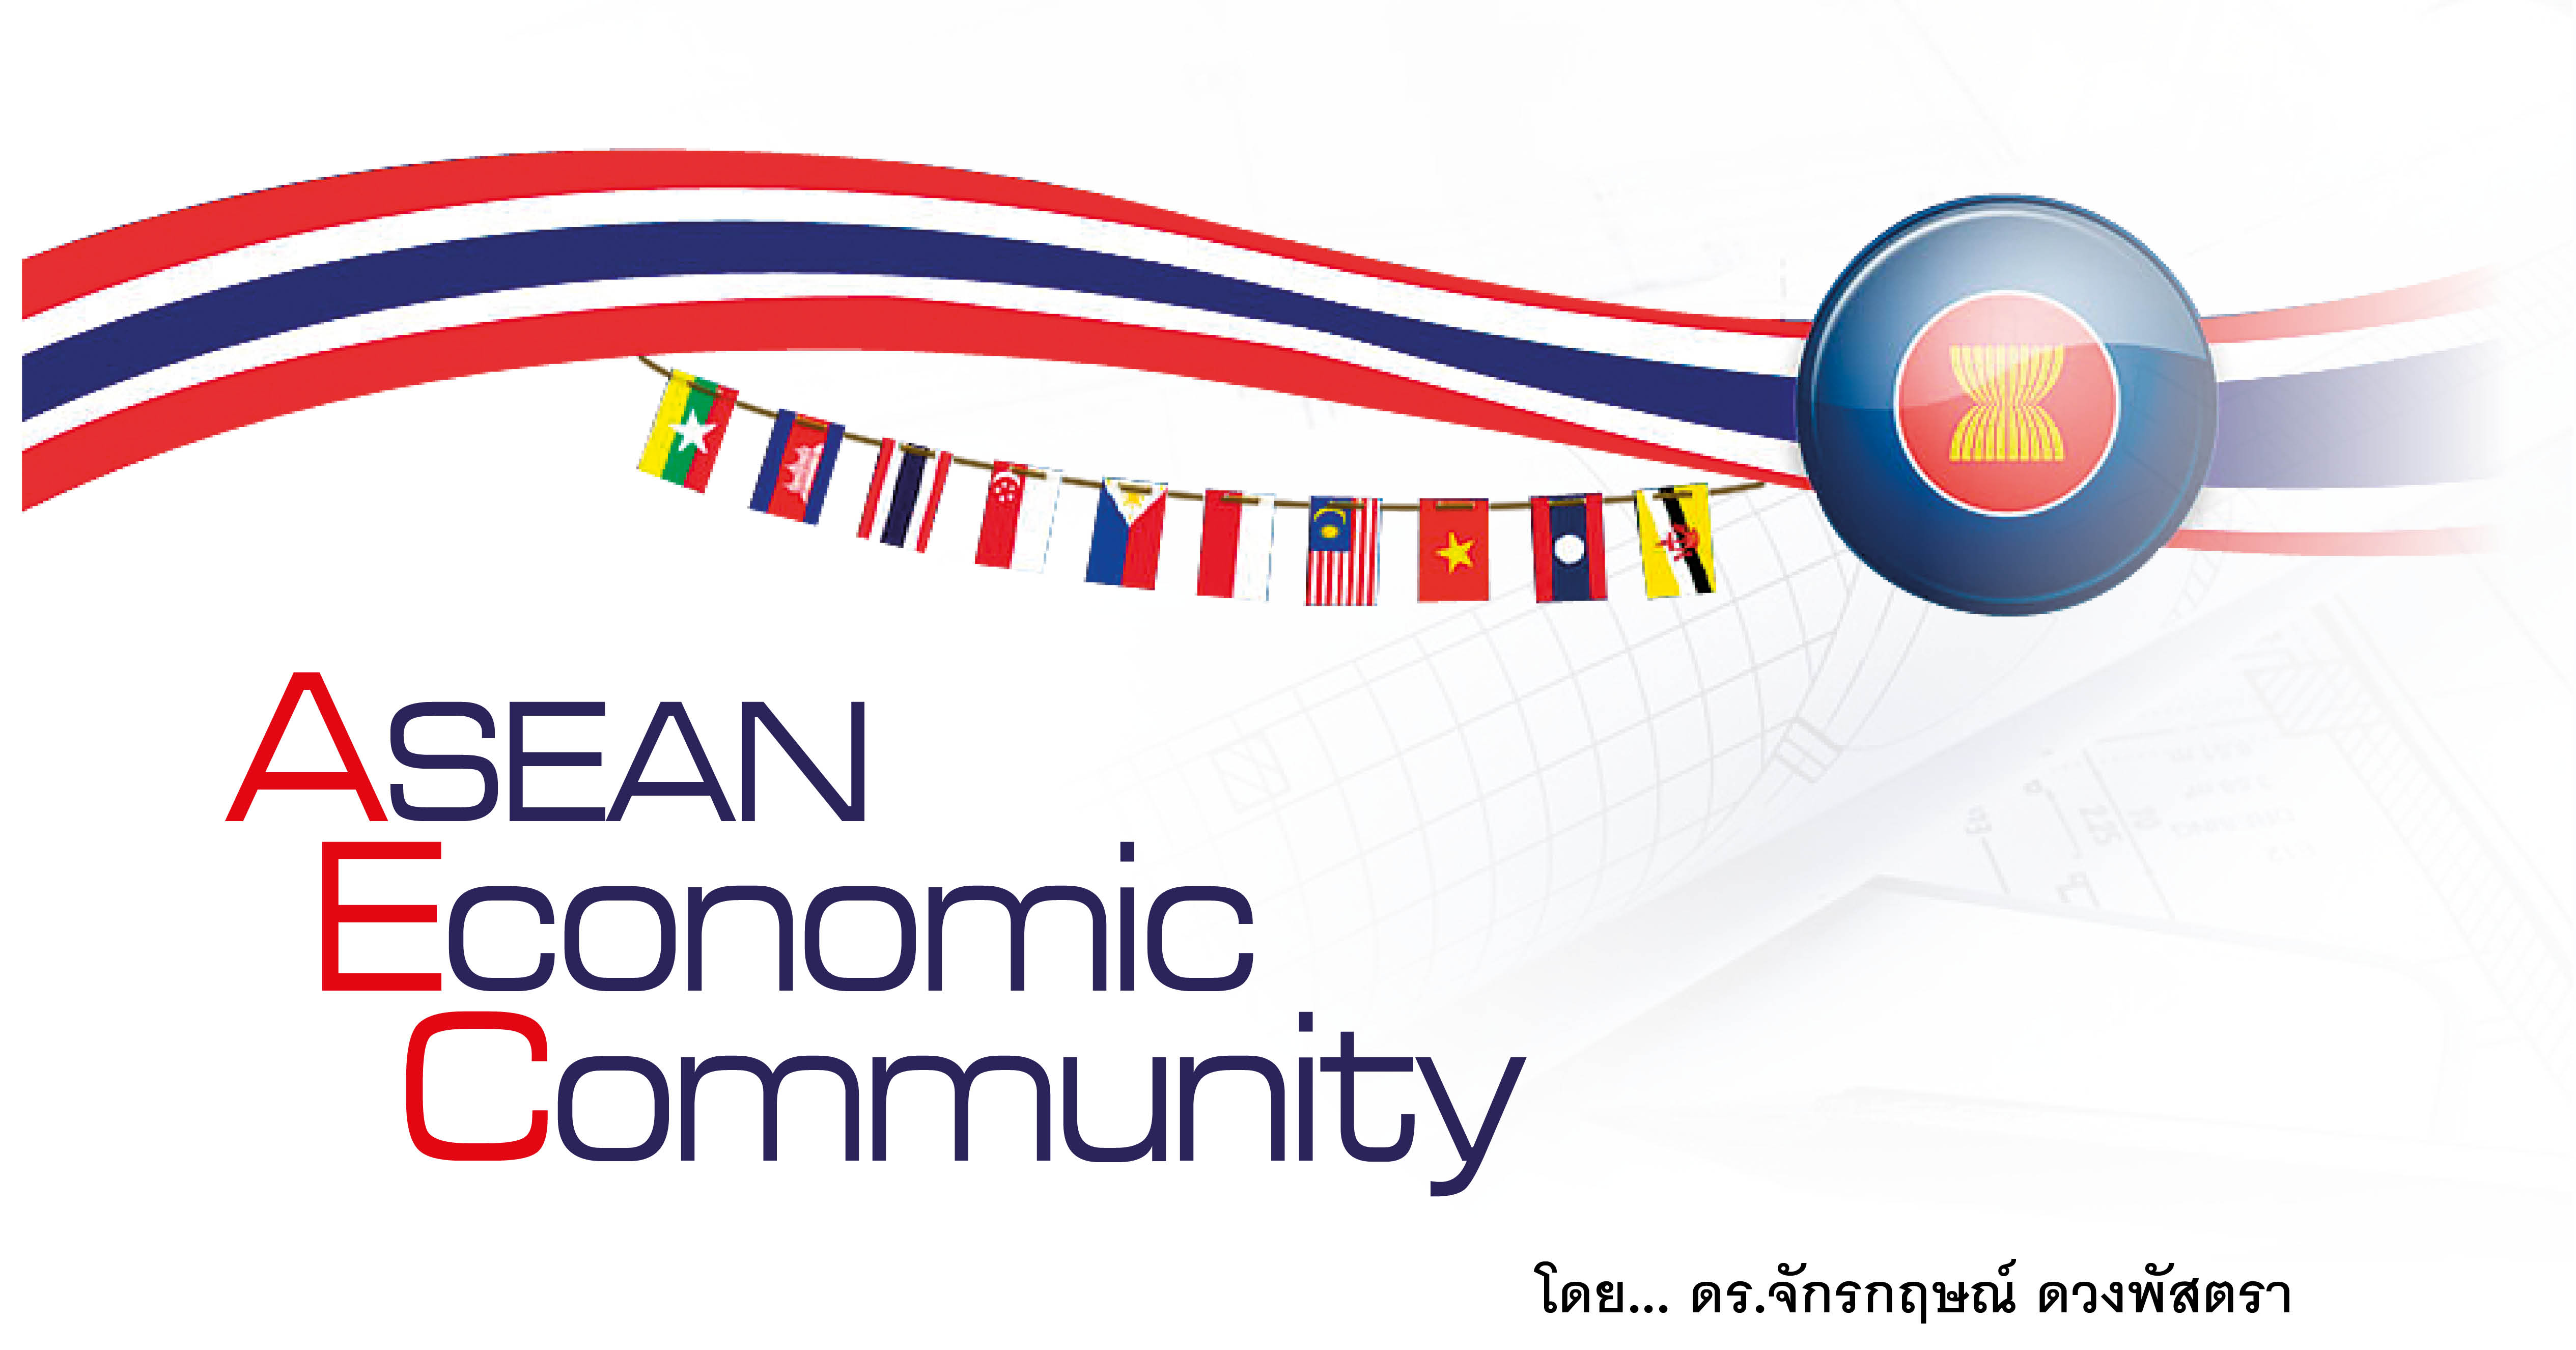 Union of Pan Asian Communities (UPAC)